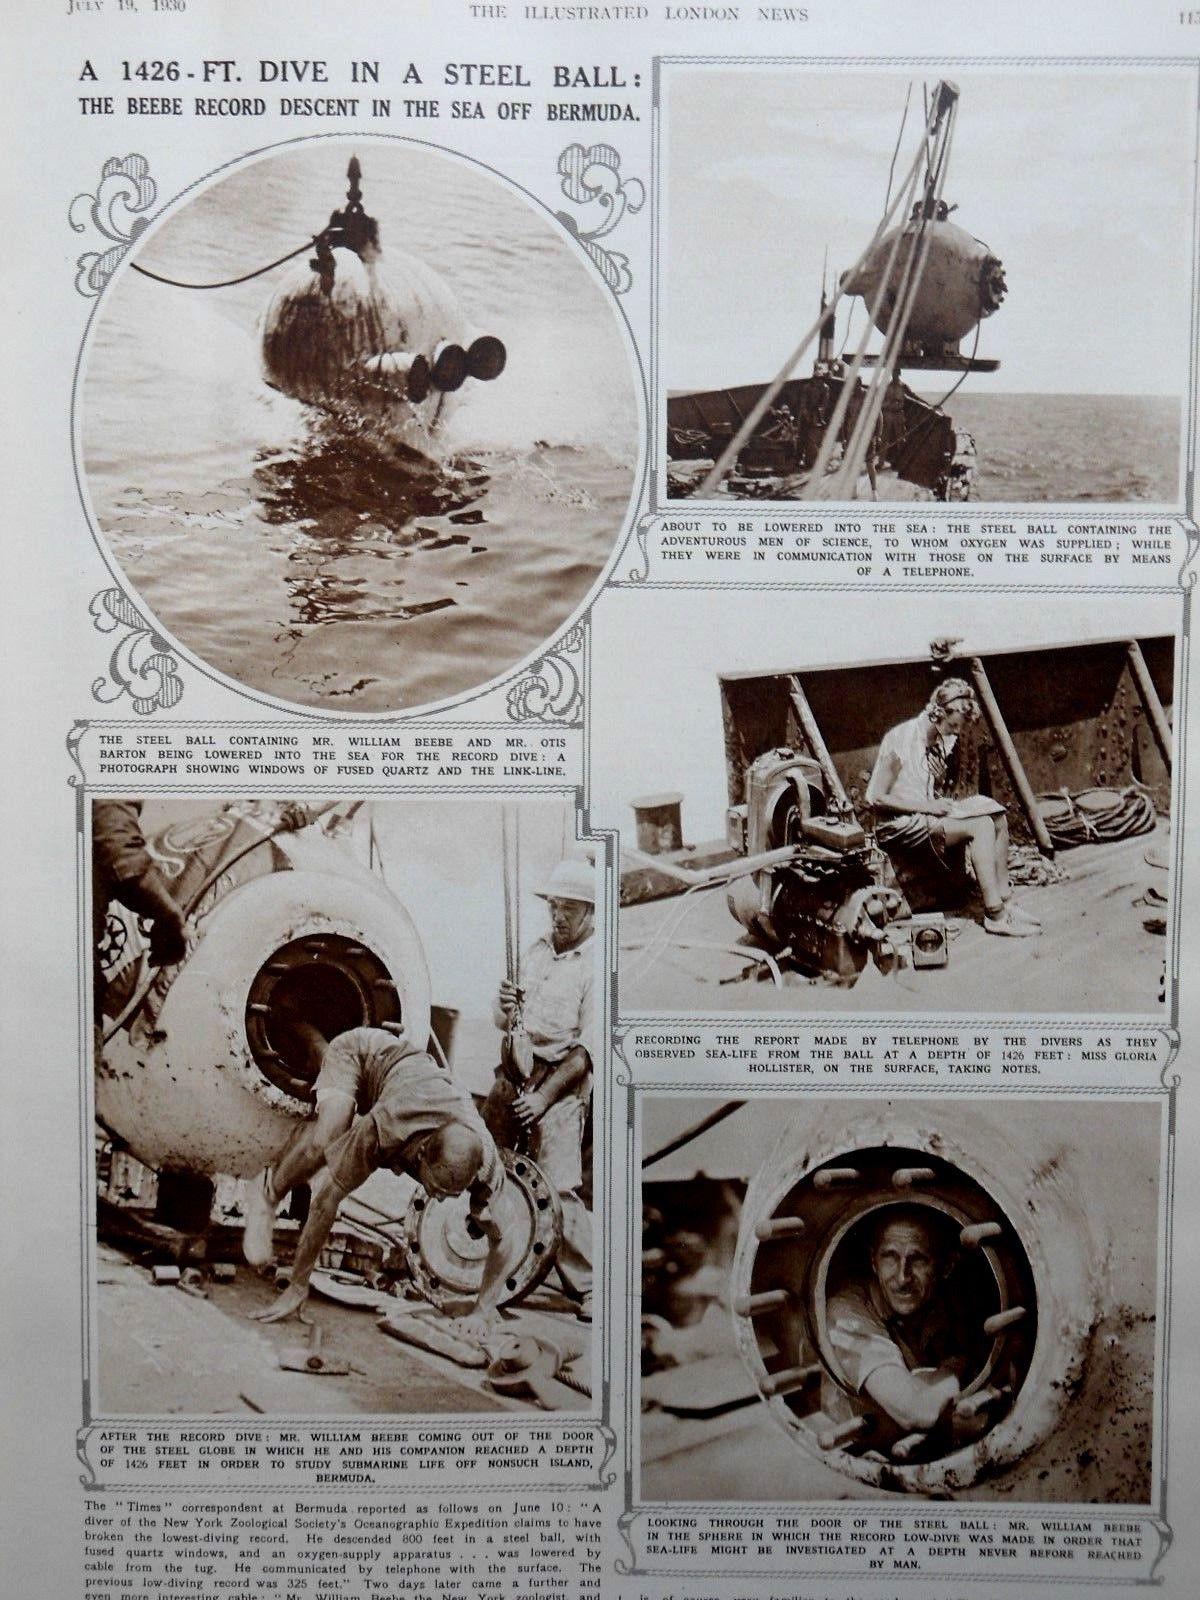 1930 London News illustrated Beebe Dive in Bermuda